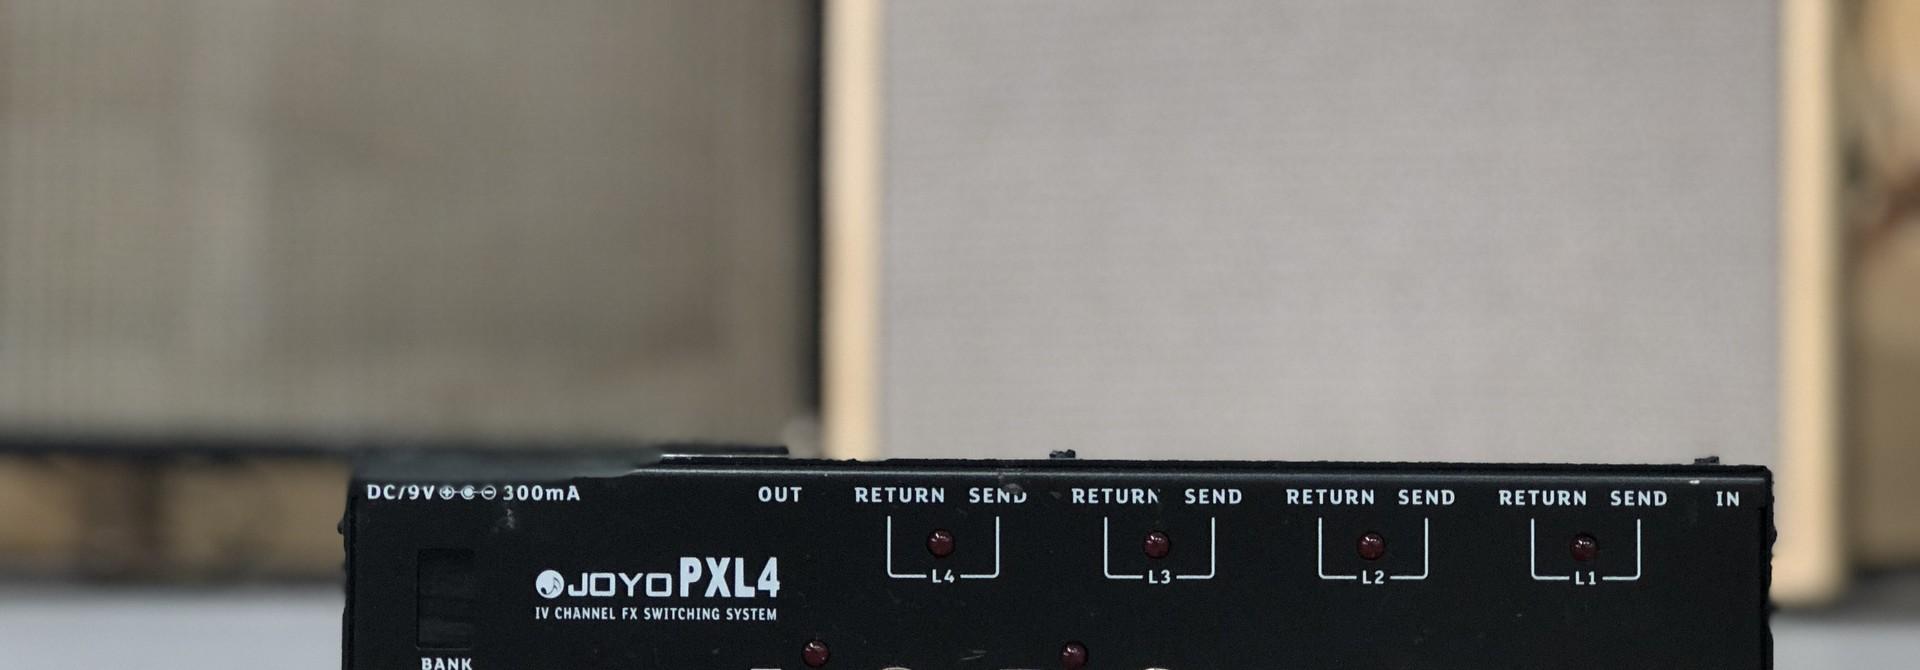 Joyo PXL4 4-channel FX Switching System